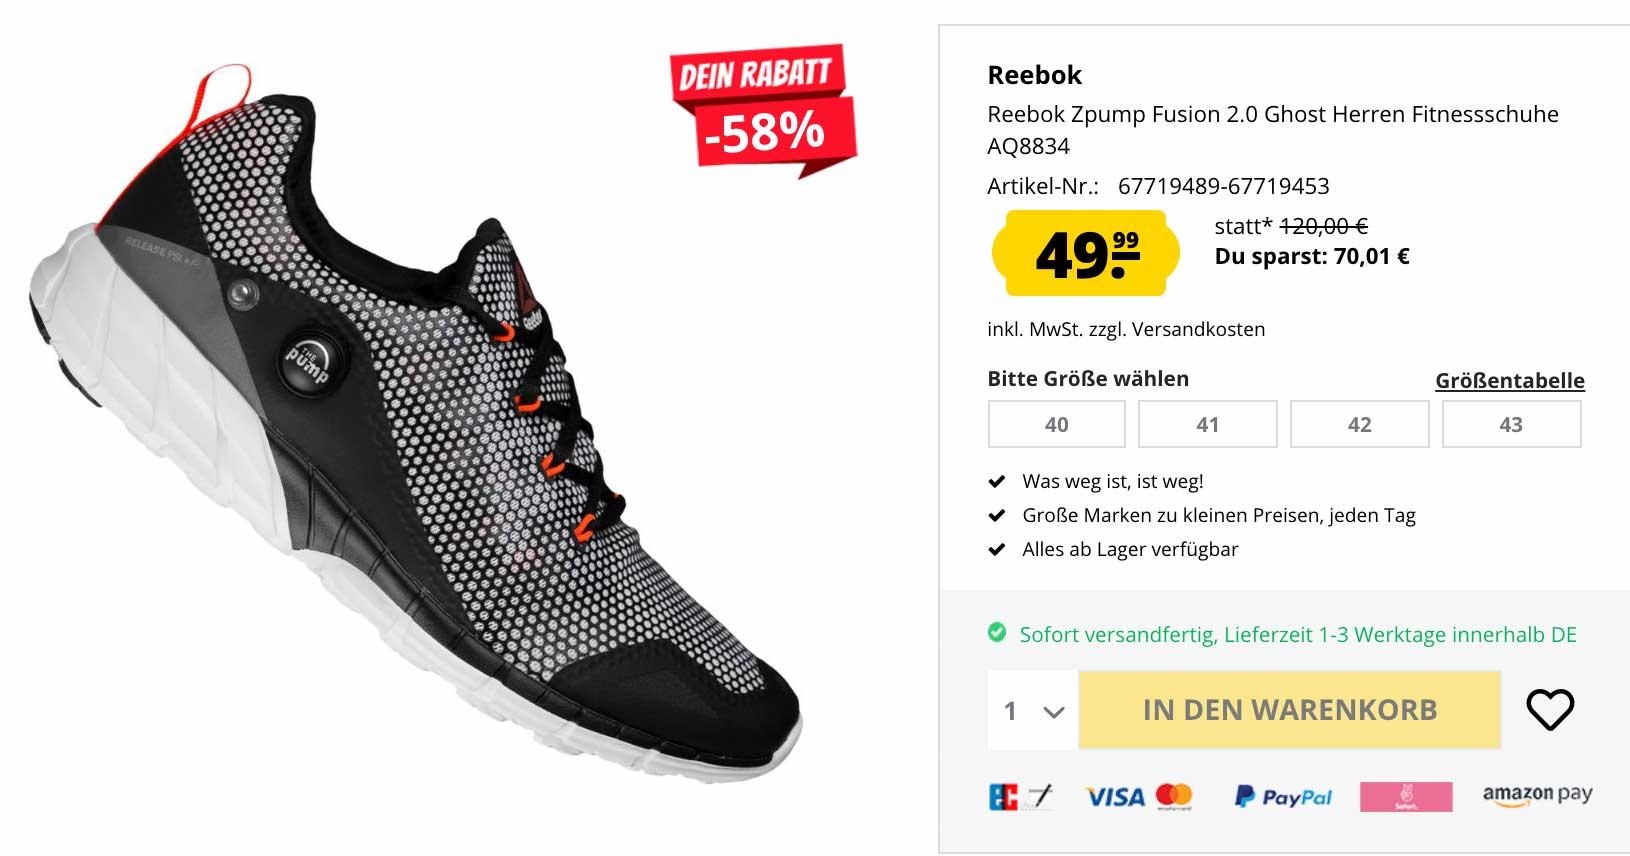 Reebok: 58% Rabatt auf Zpump Fusion 2.0 Ghost Fitnessschuhe